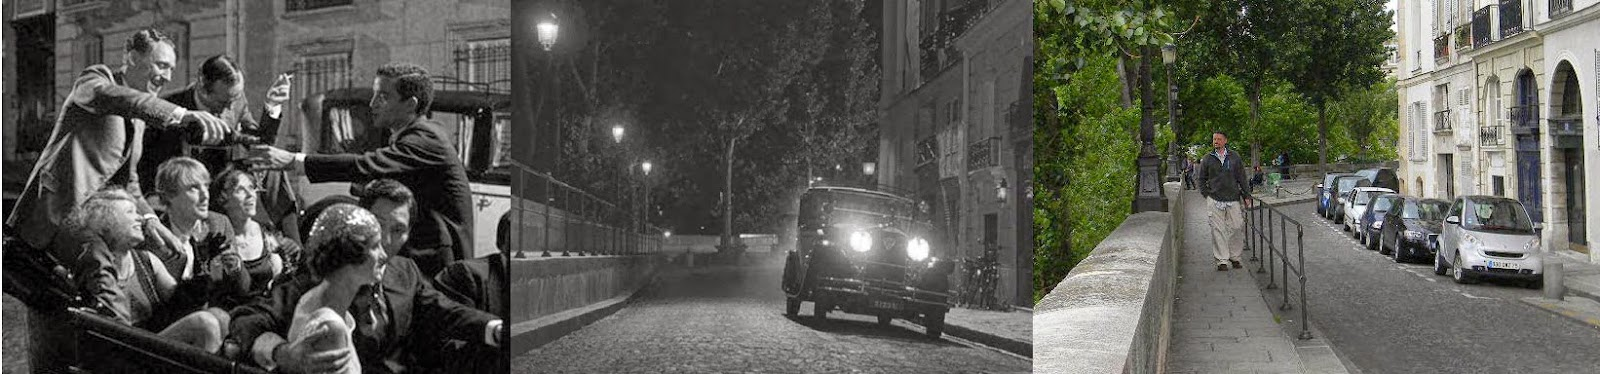 El Par�s del cine: Midnight in Paris   Haizea Urkiola